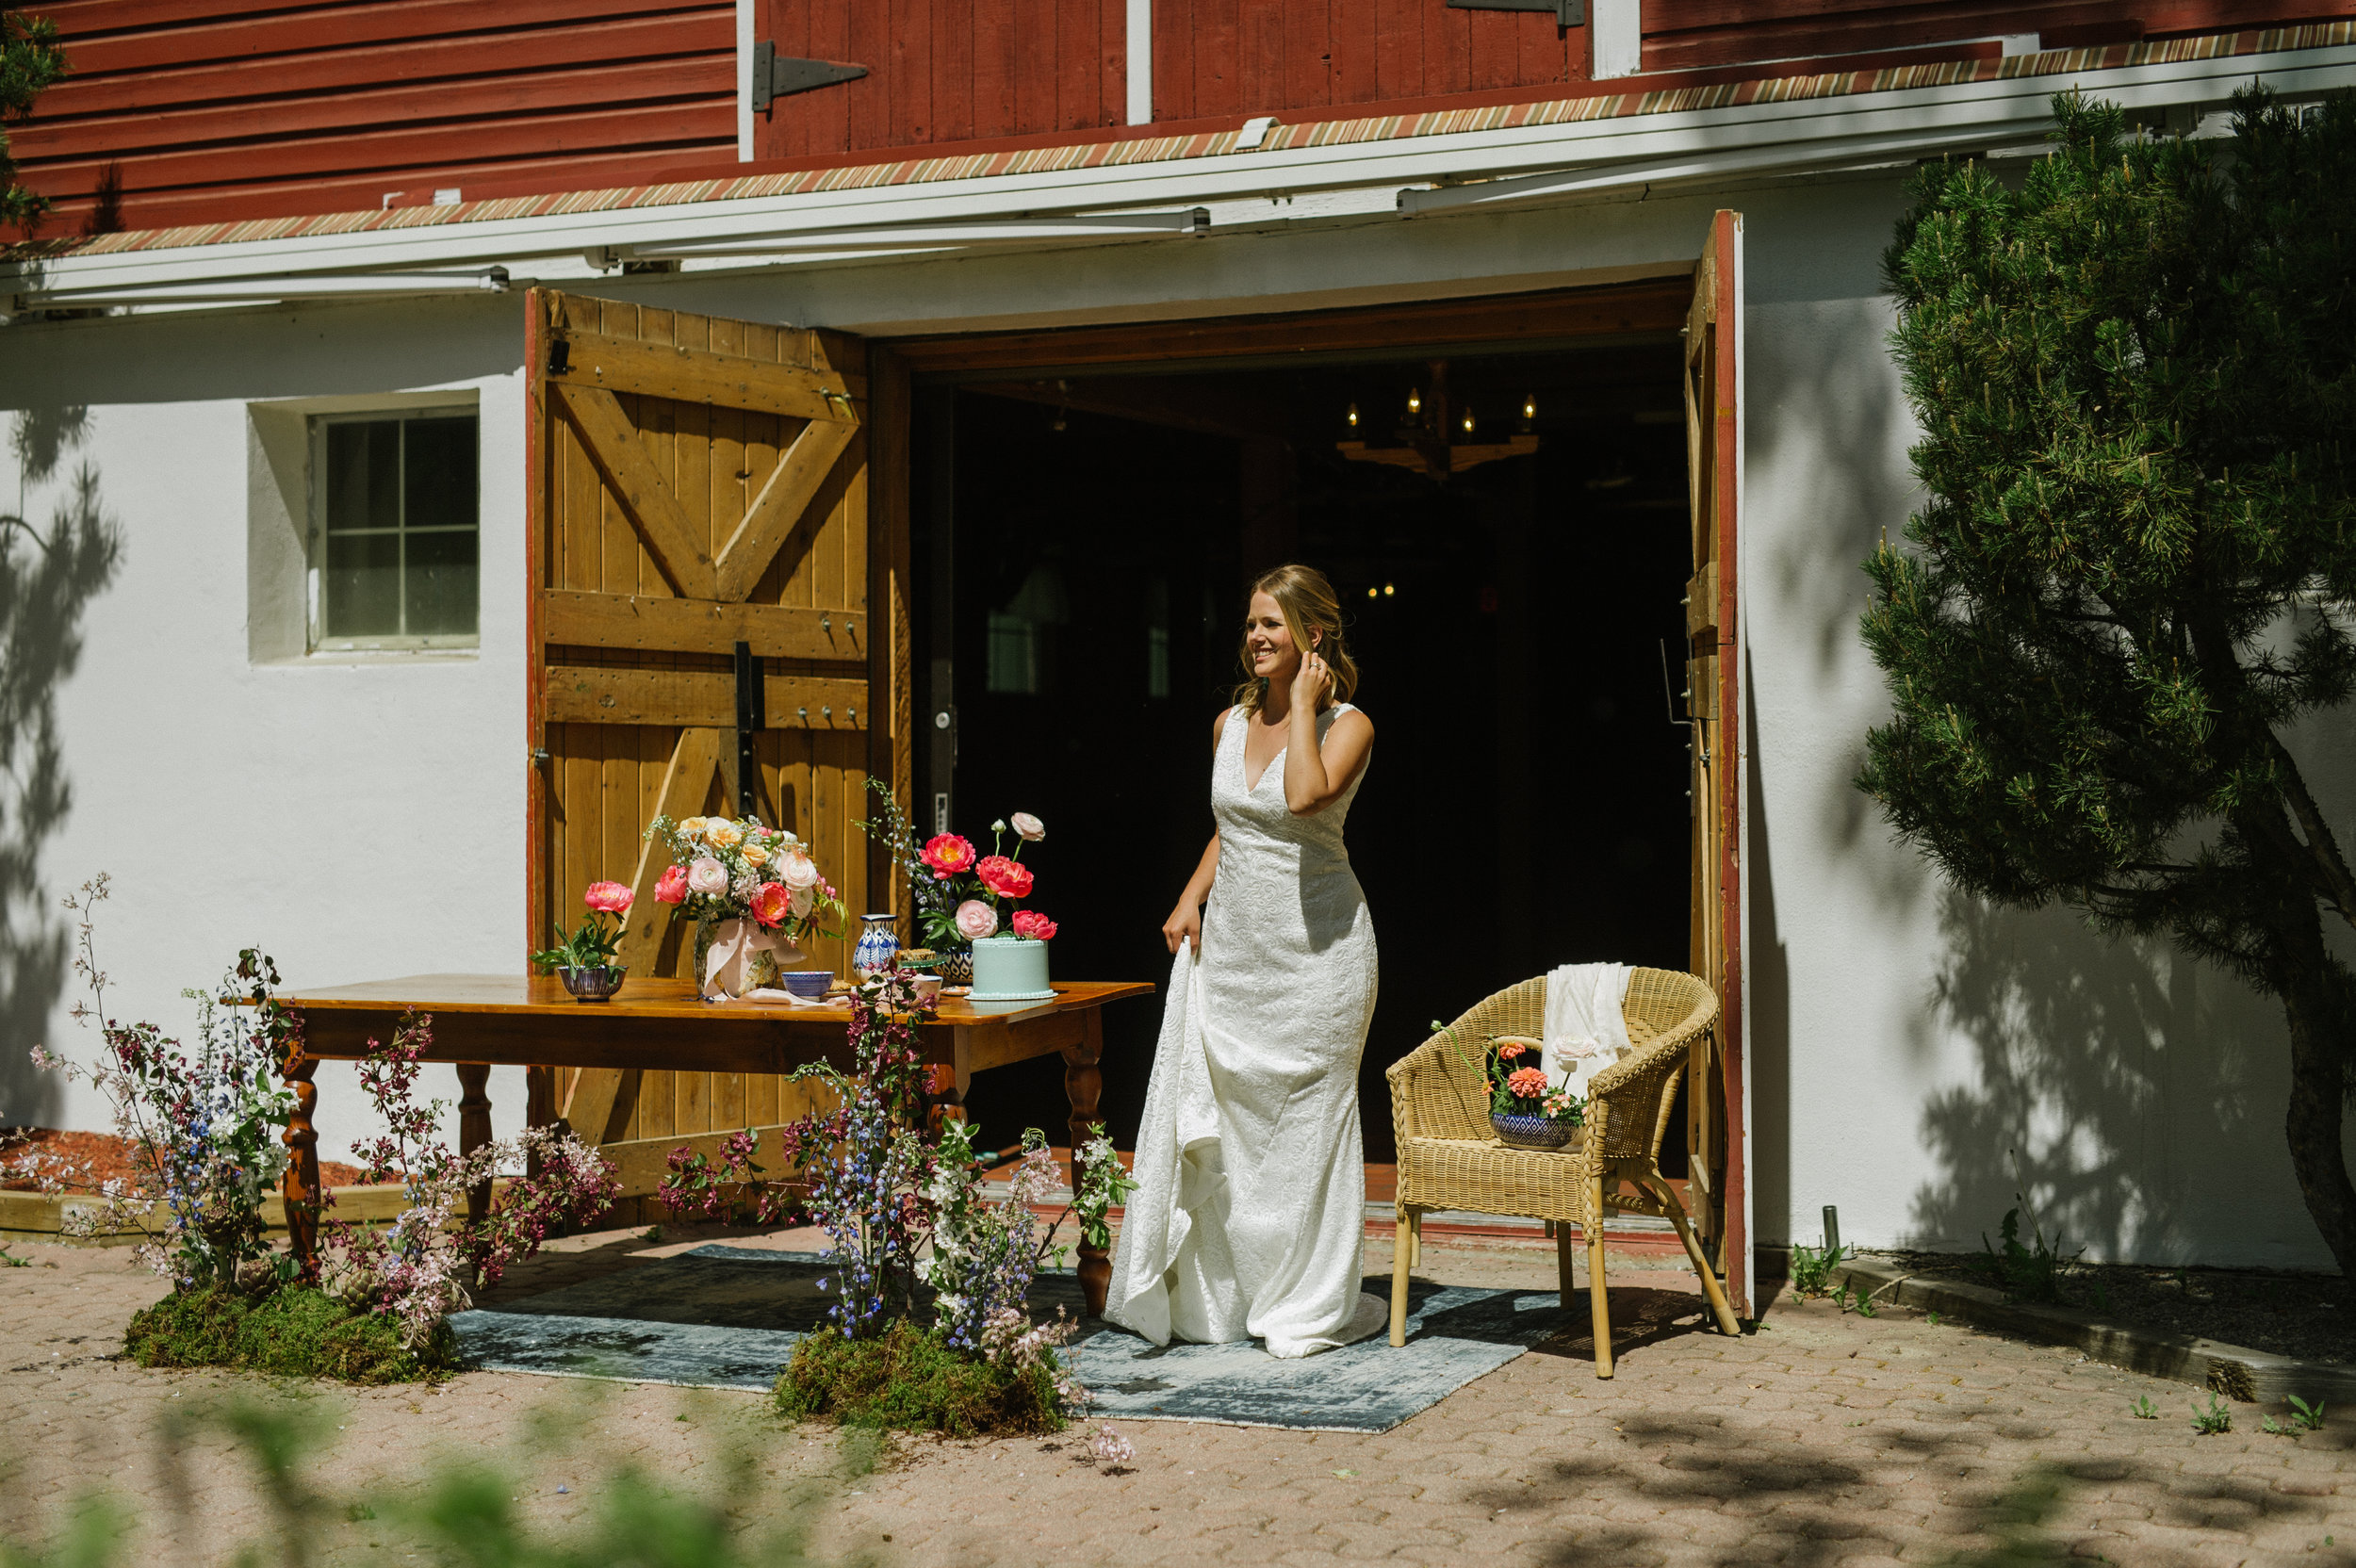 Calgary_Wedding_Photography_Spring_Barn_Wedding_Shoot_2018_HR068.jpg